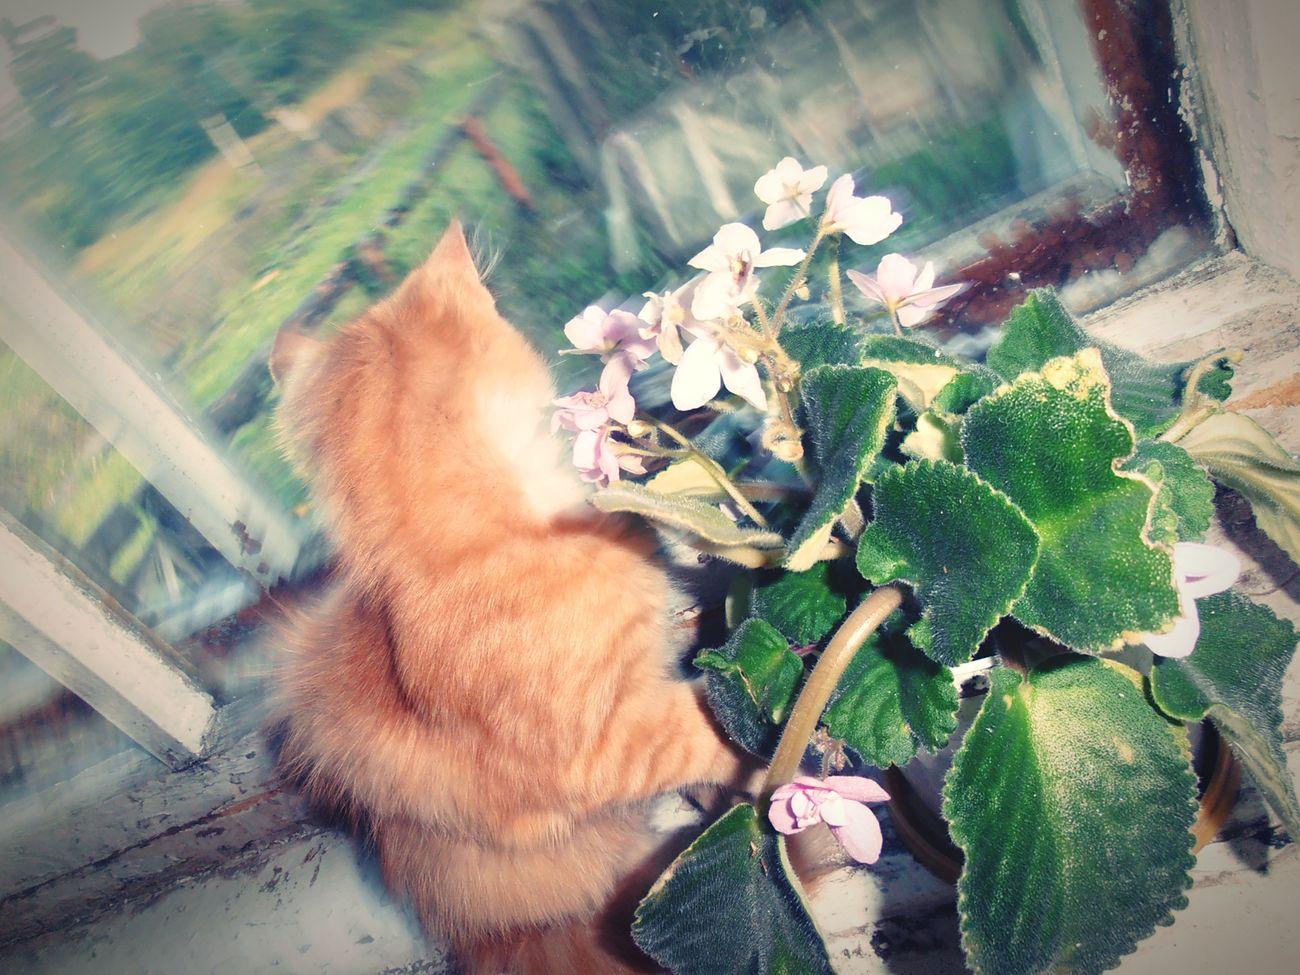 Рыжие🌻 Cats 🐱 Kitty Animal_collection Animalphotography рыжий кот Getting Creative котики😻 котик❤️ любимый кот